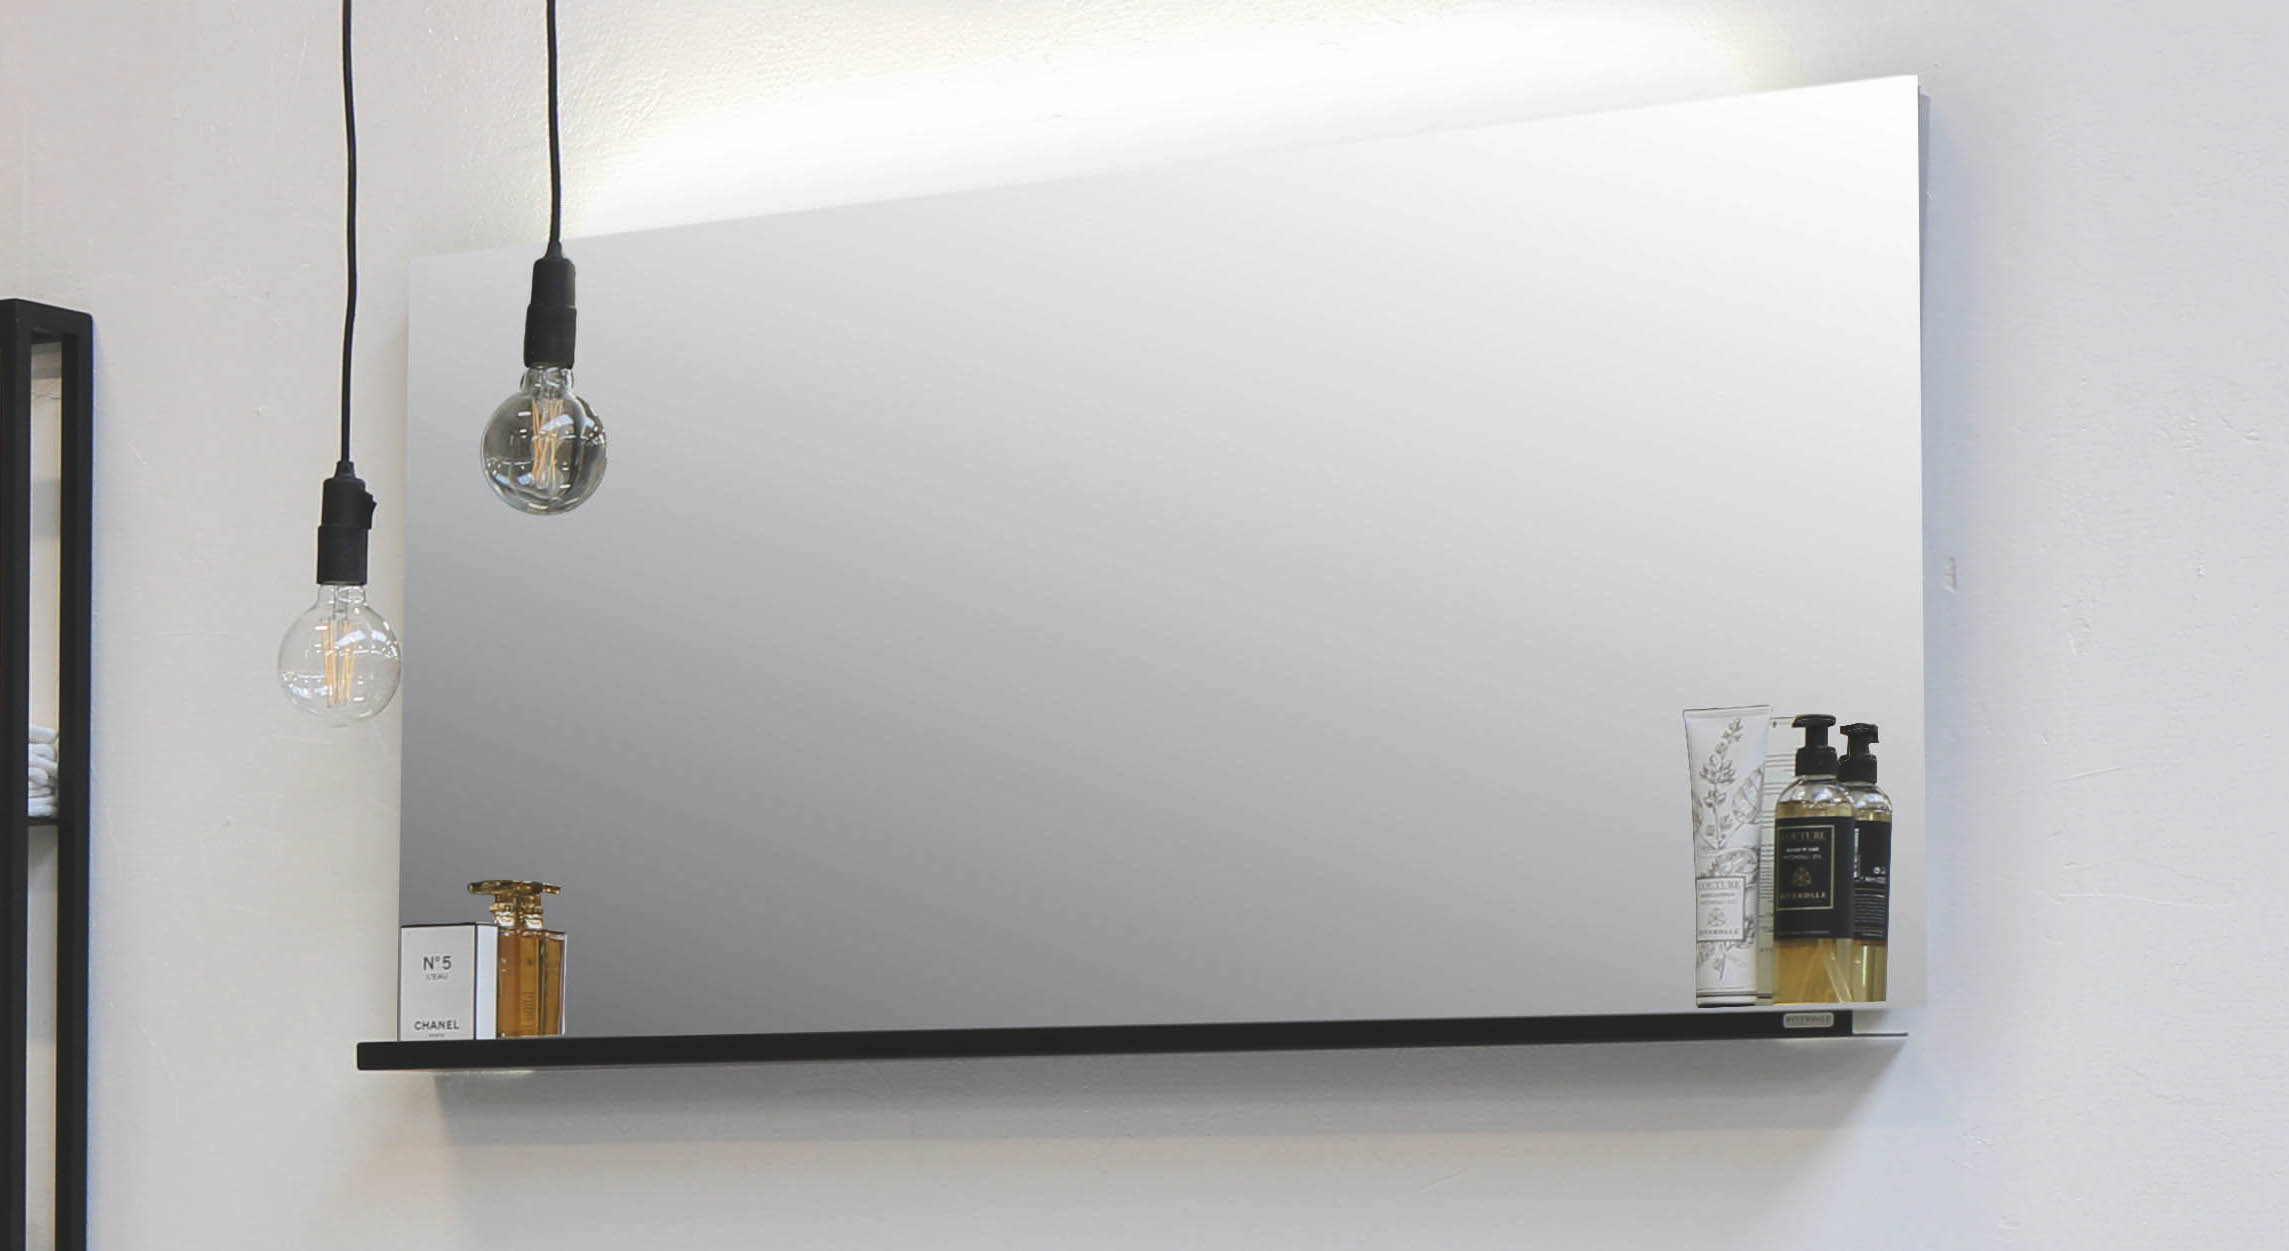 Riverdale spiegel met indirecte led boven- en onderverlichting - alu 1400x30mm (bxd)